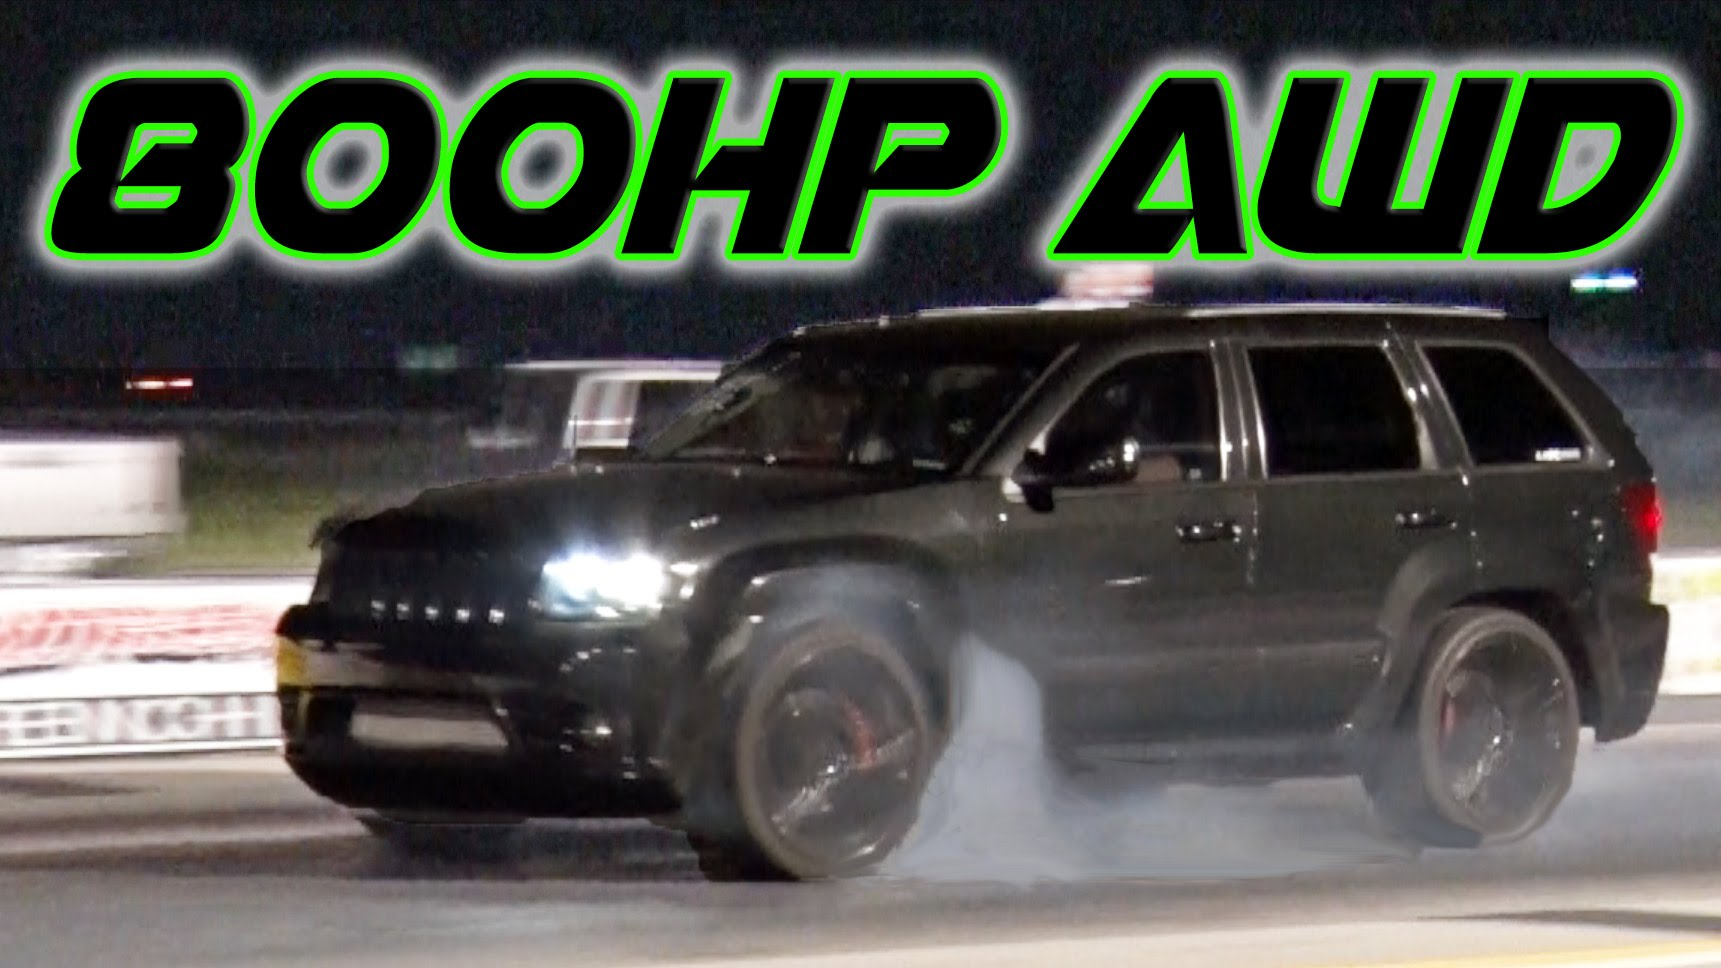 Fast Awd Cars >> Drag Racing: 800HP AWD Jeep SRT8 | DragTimes.com Drag ...